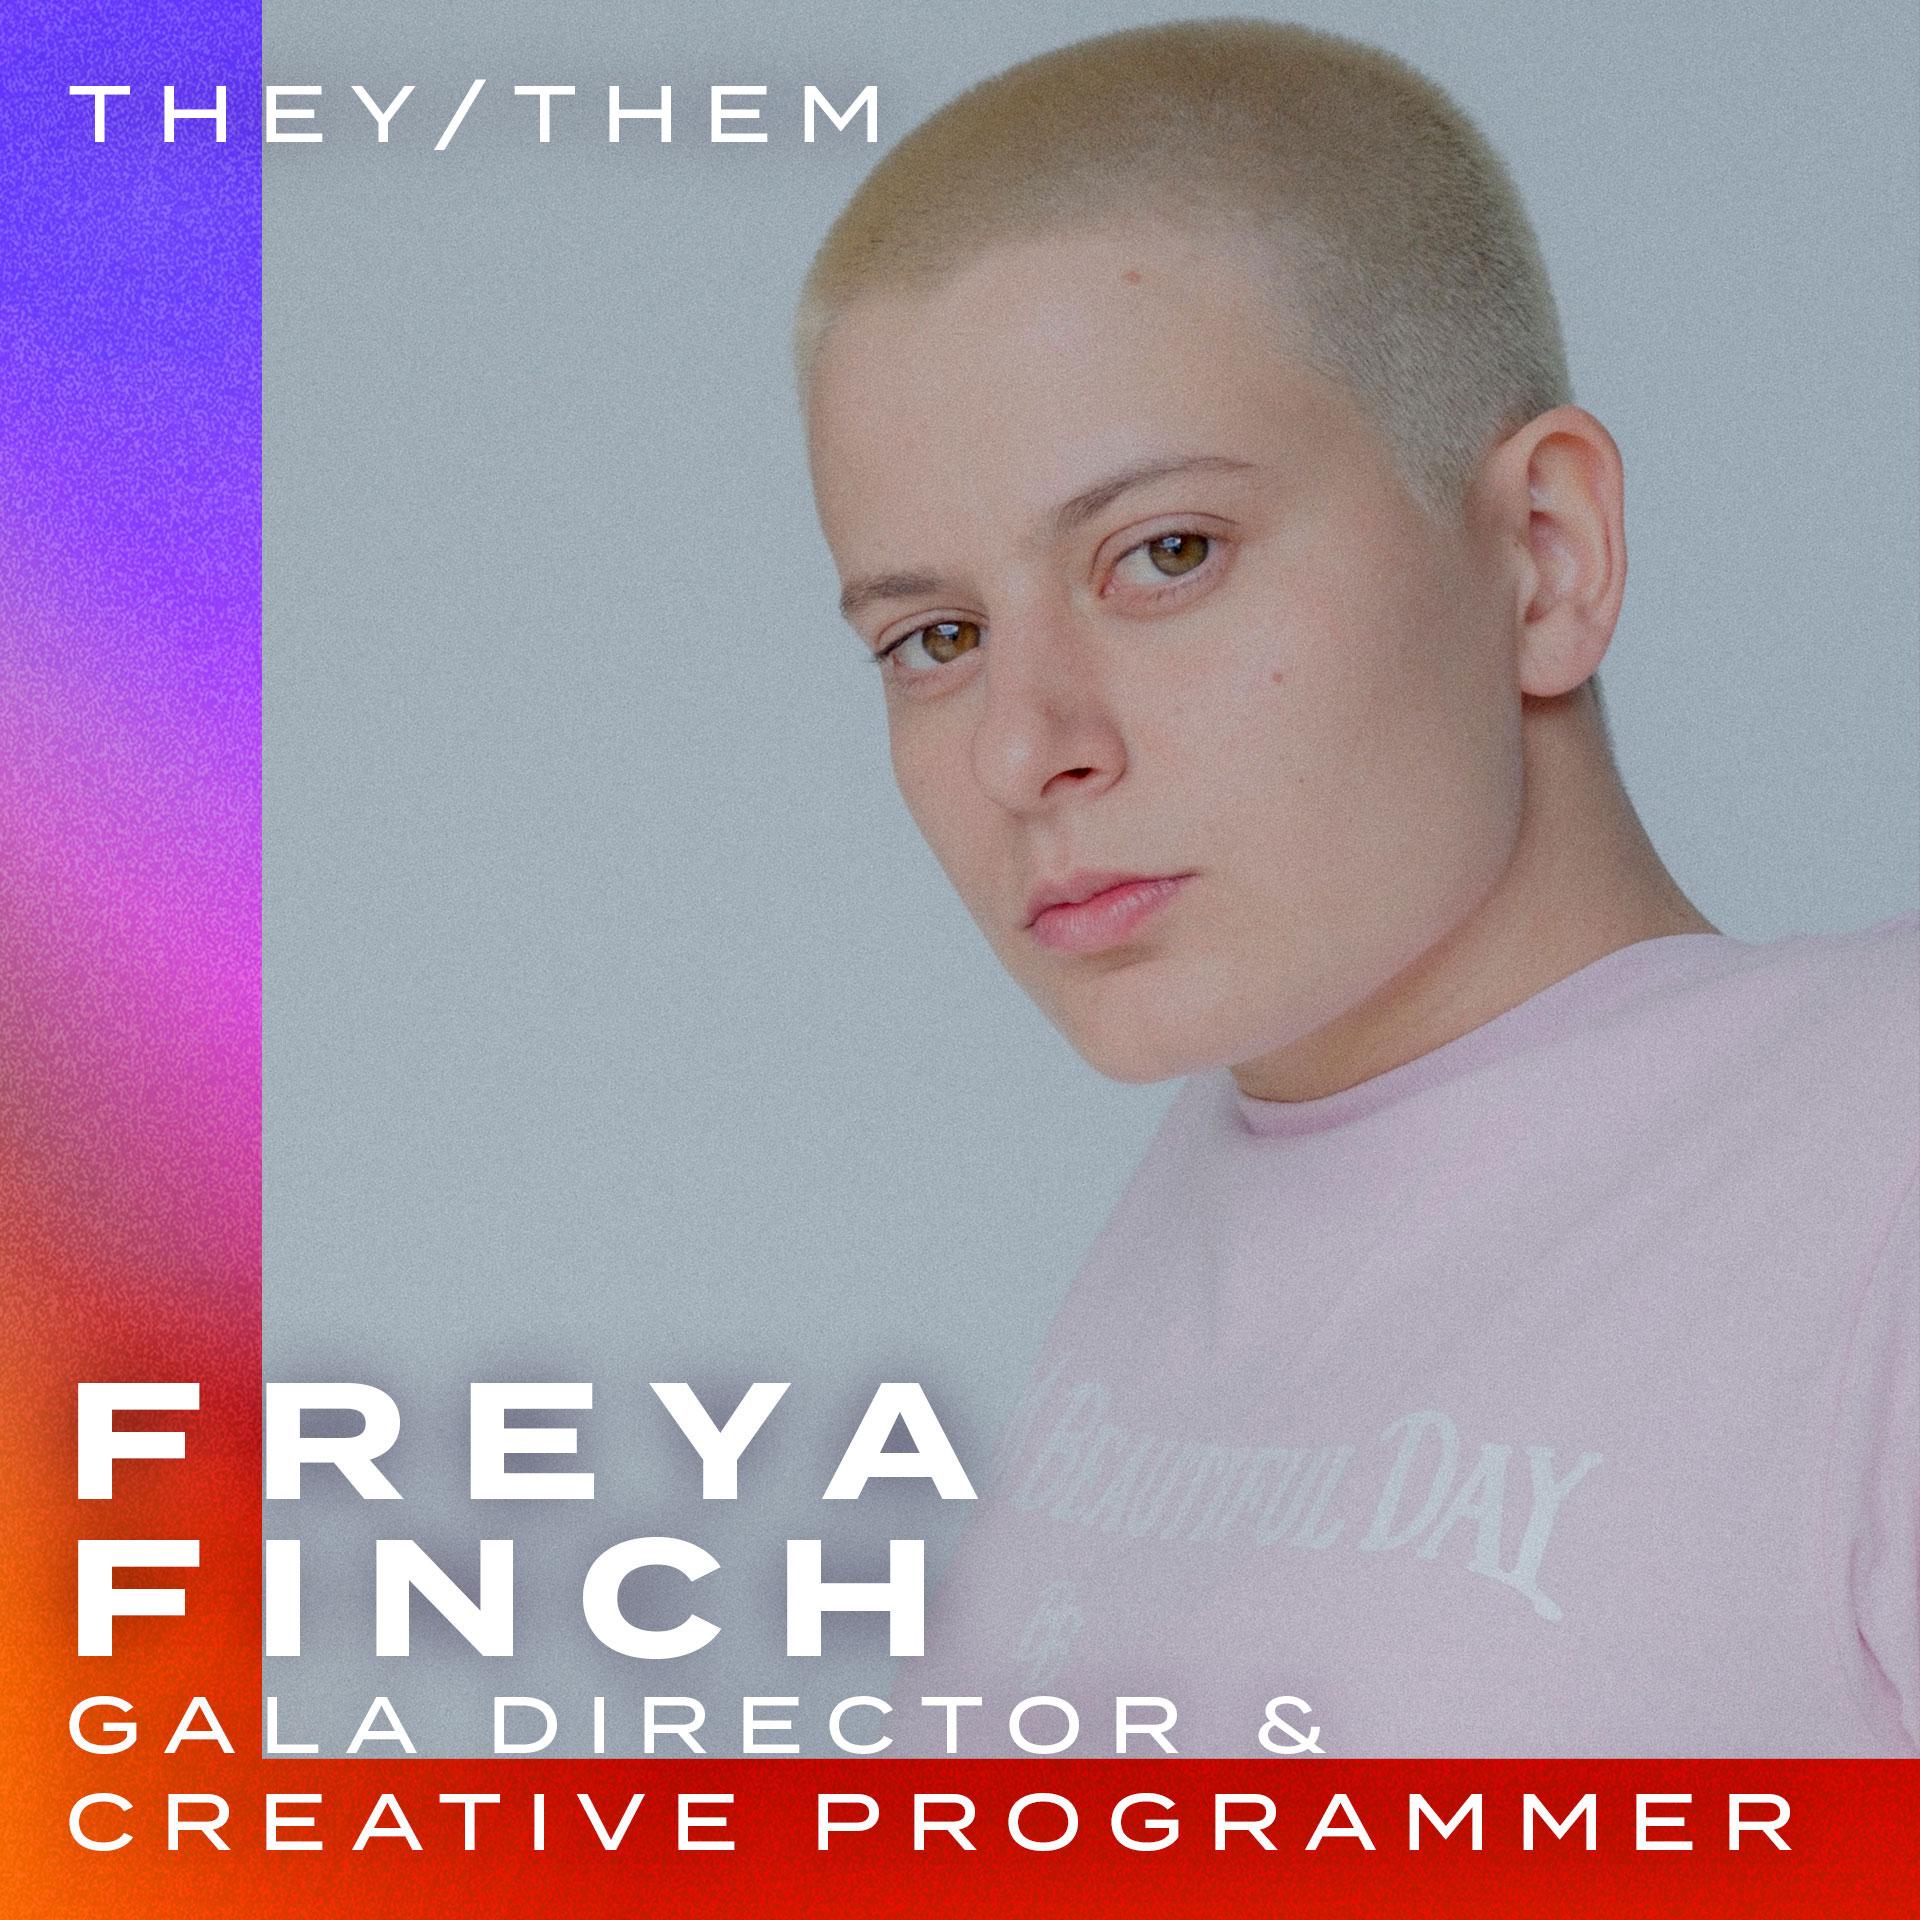 Freya Finch